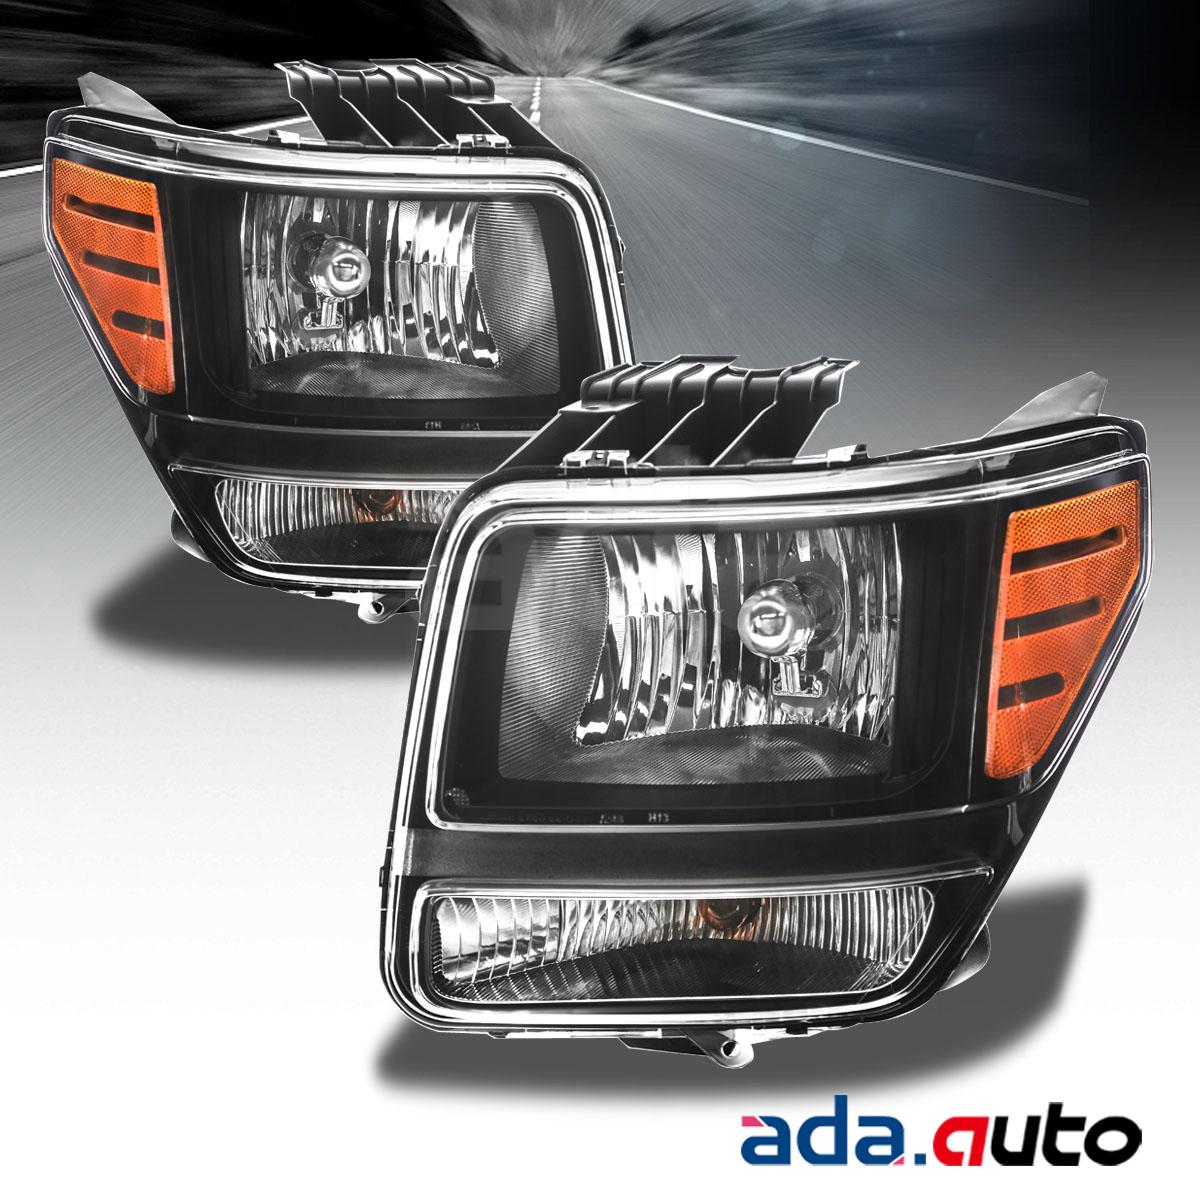 2007-2012 Dodge Nitro Black Headlights Replacement Lamps